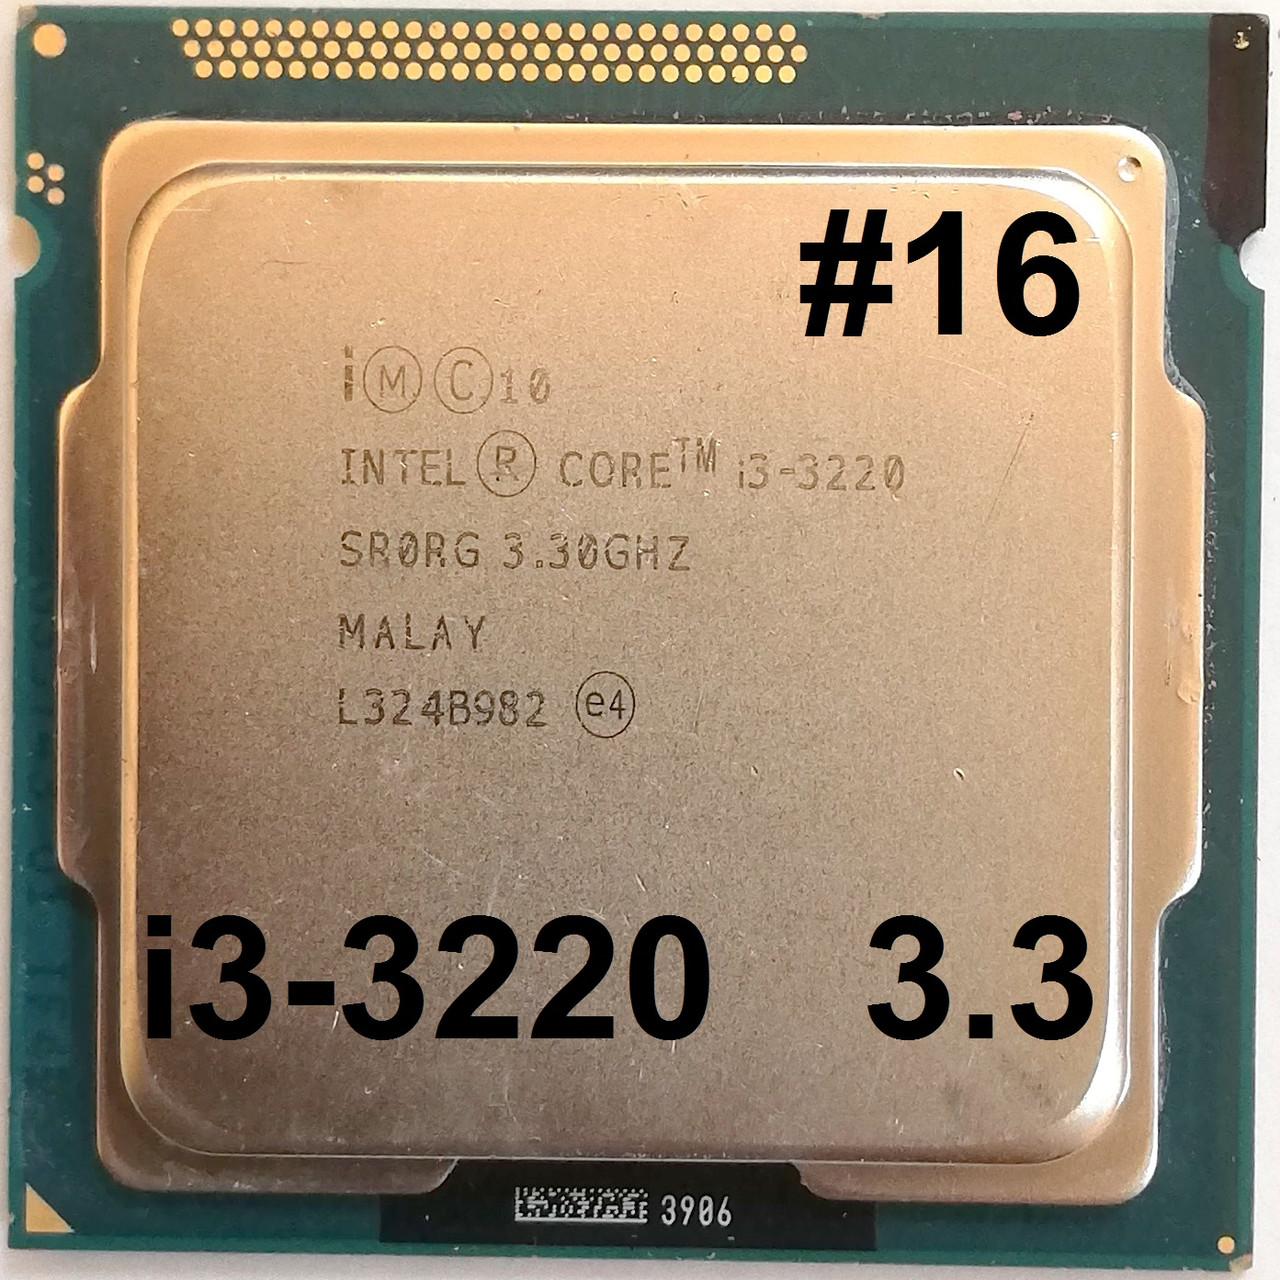 Процессор ЛОТ#16 Intel Core i3-3220 L1 SRORG 3.3GHz 3M Cache Socket 1155 Б/У